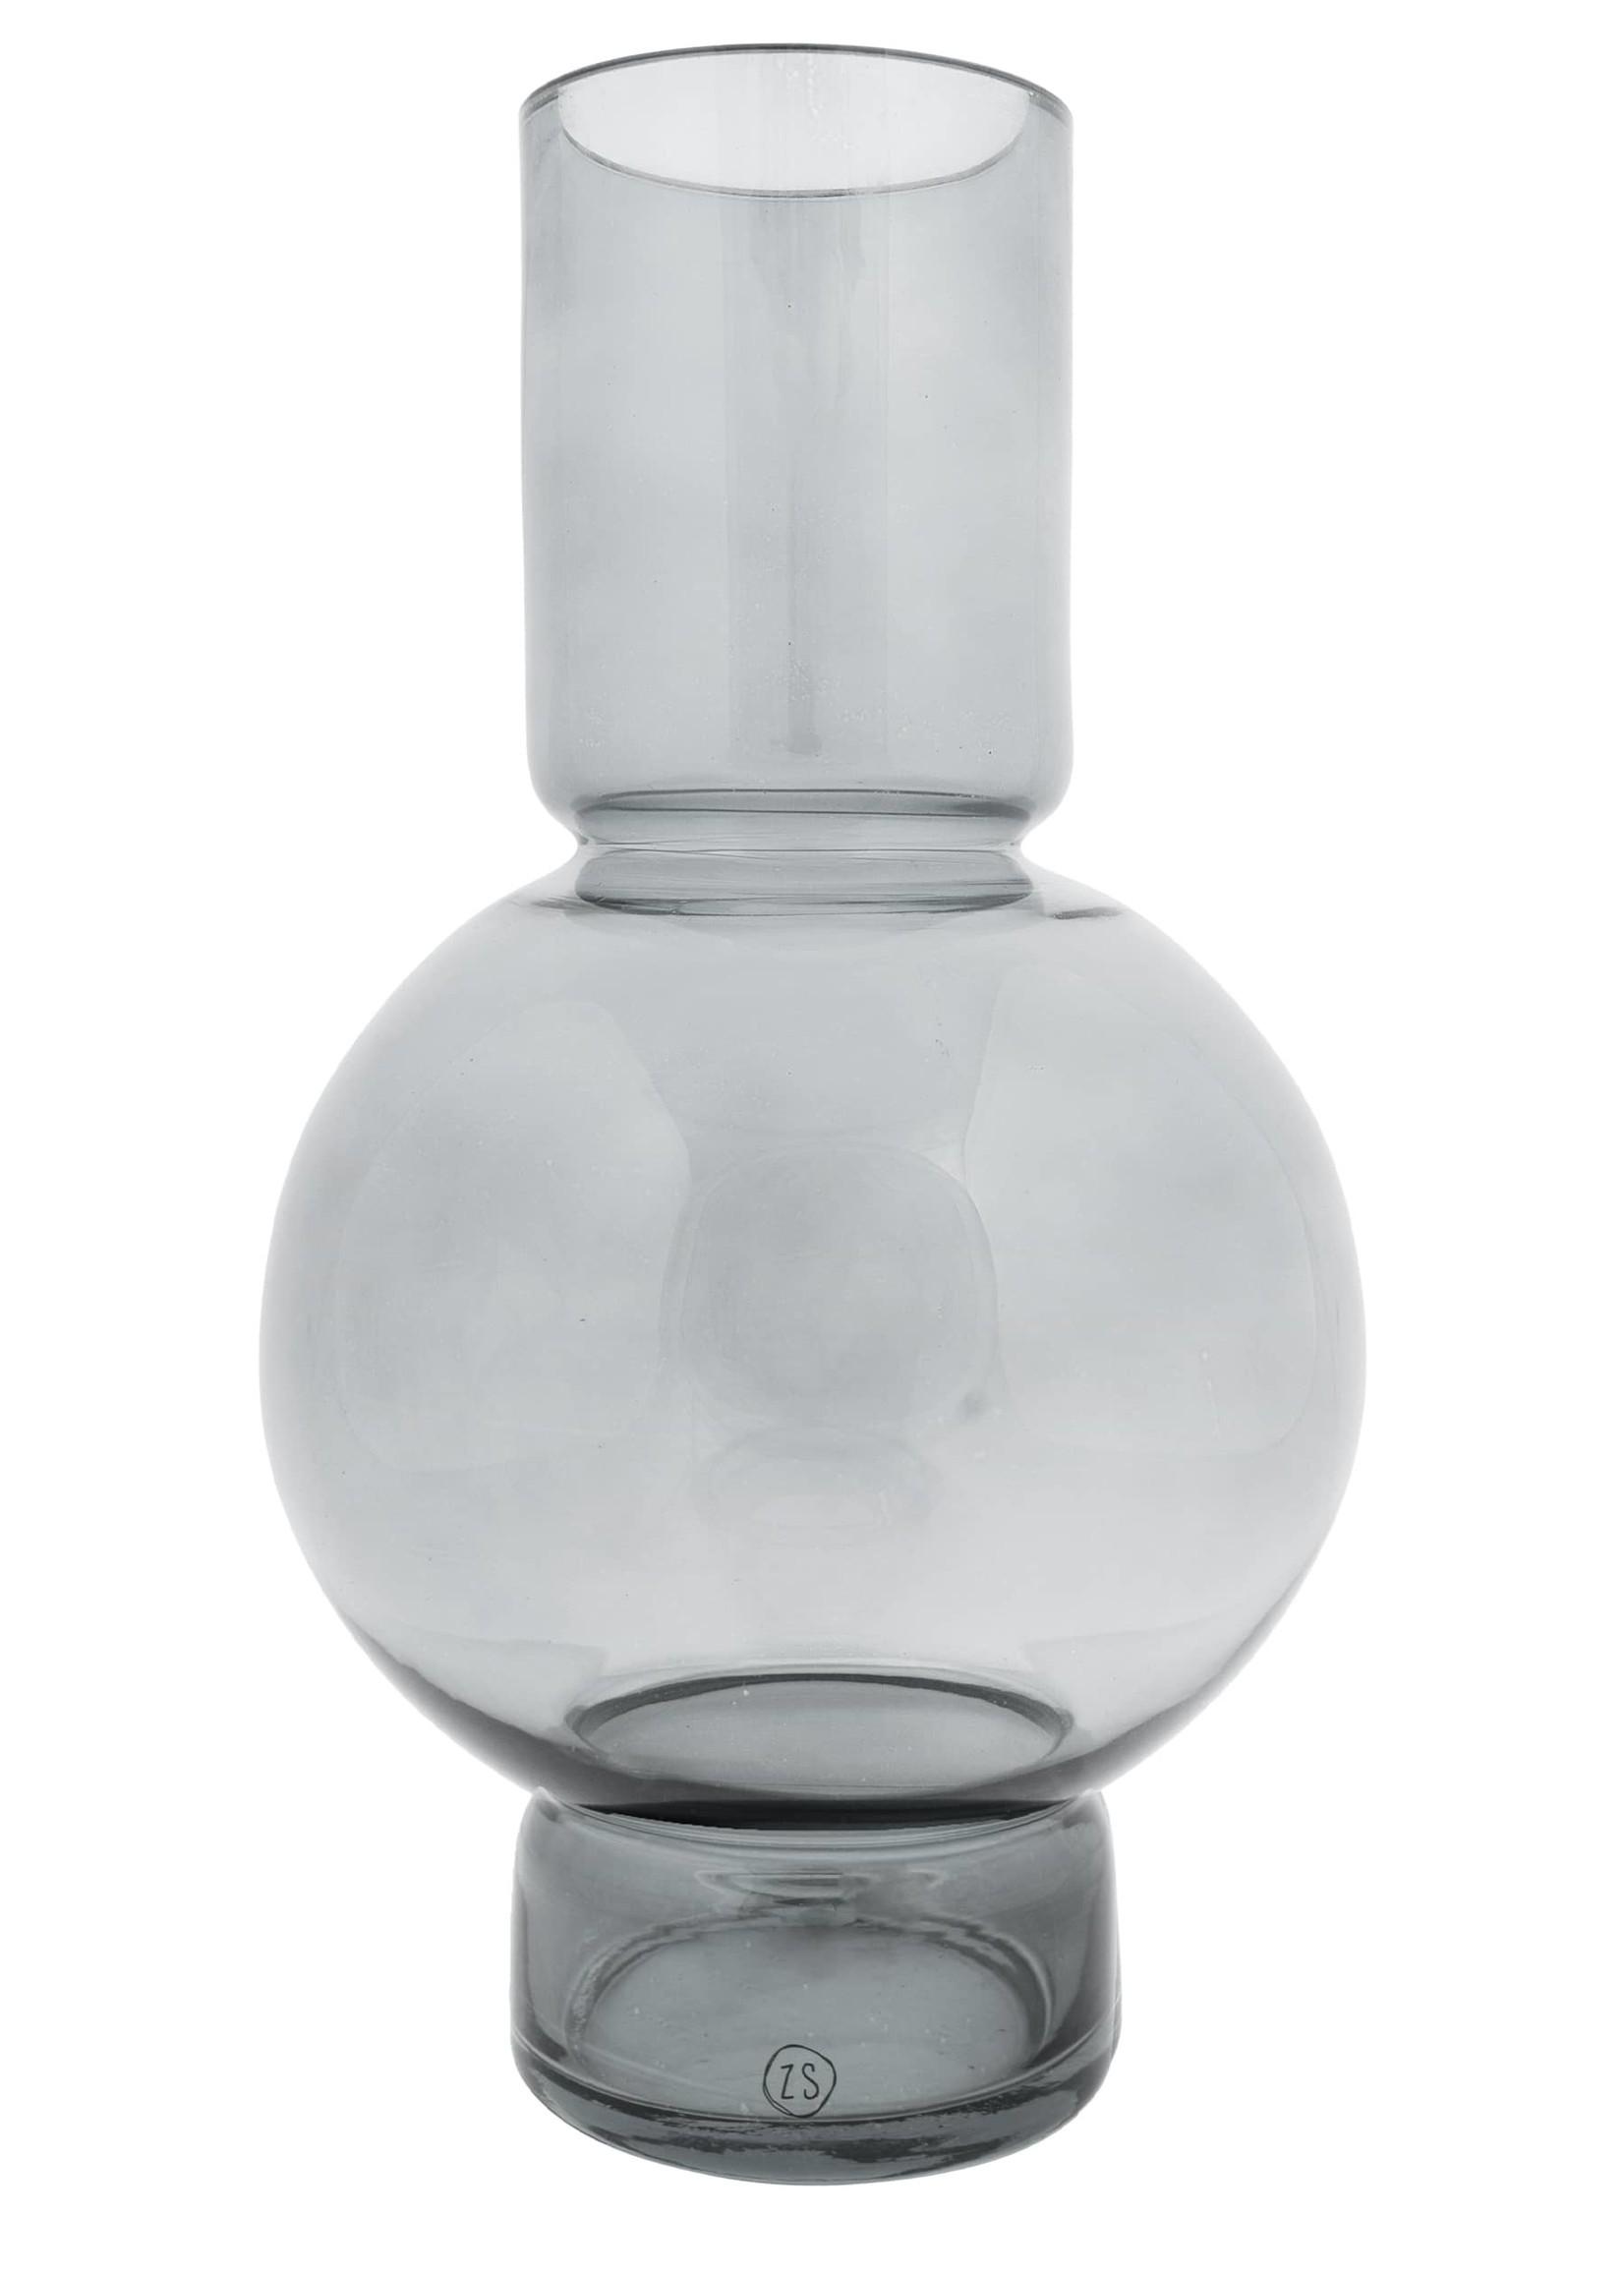 ZUSSS glazen bolvaas 17x30cm grafietgrijs